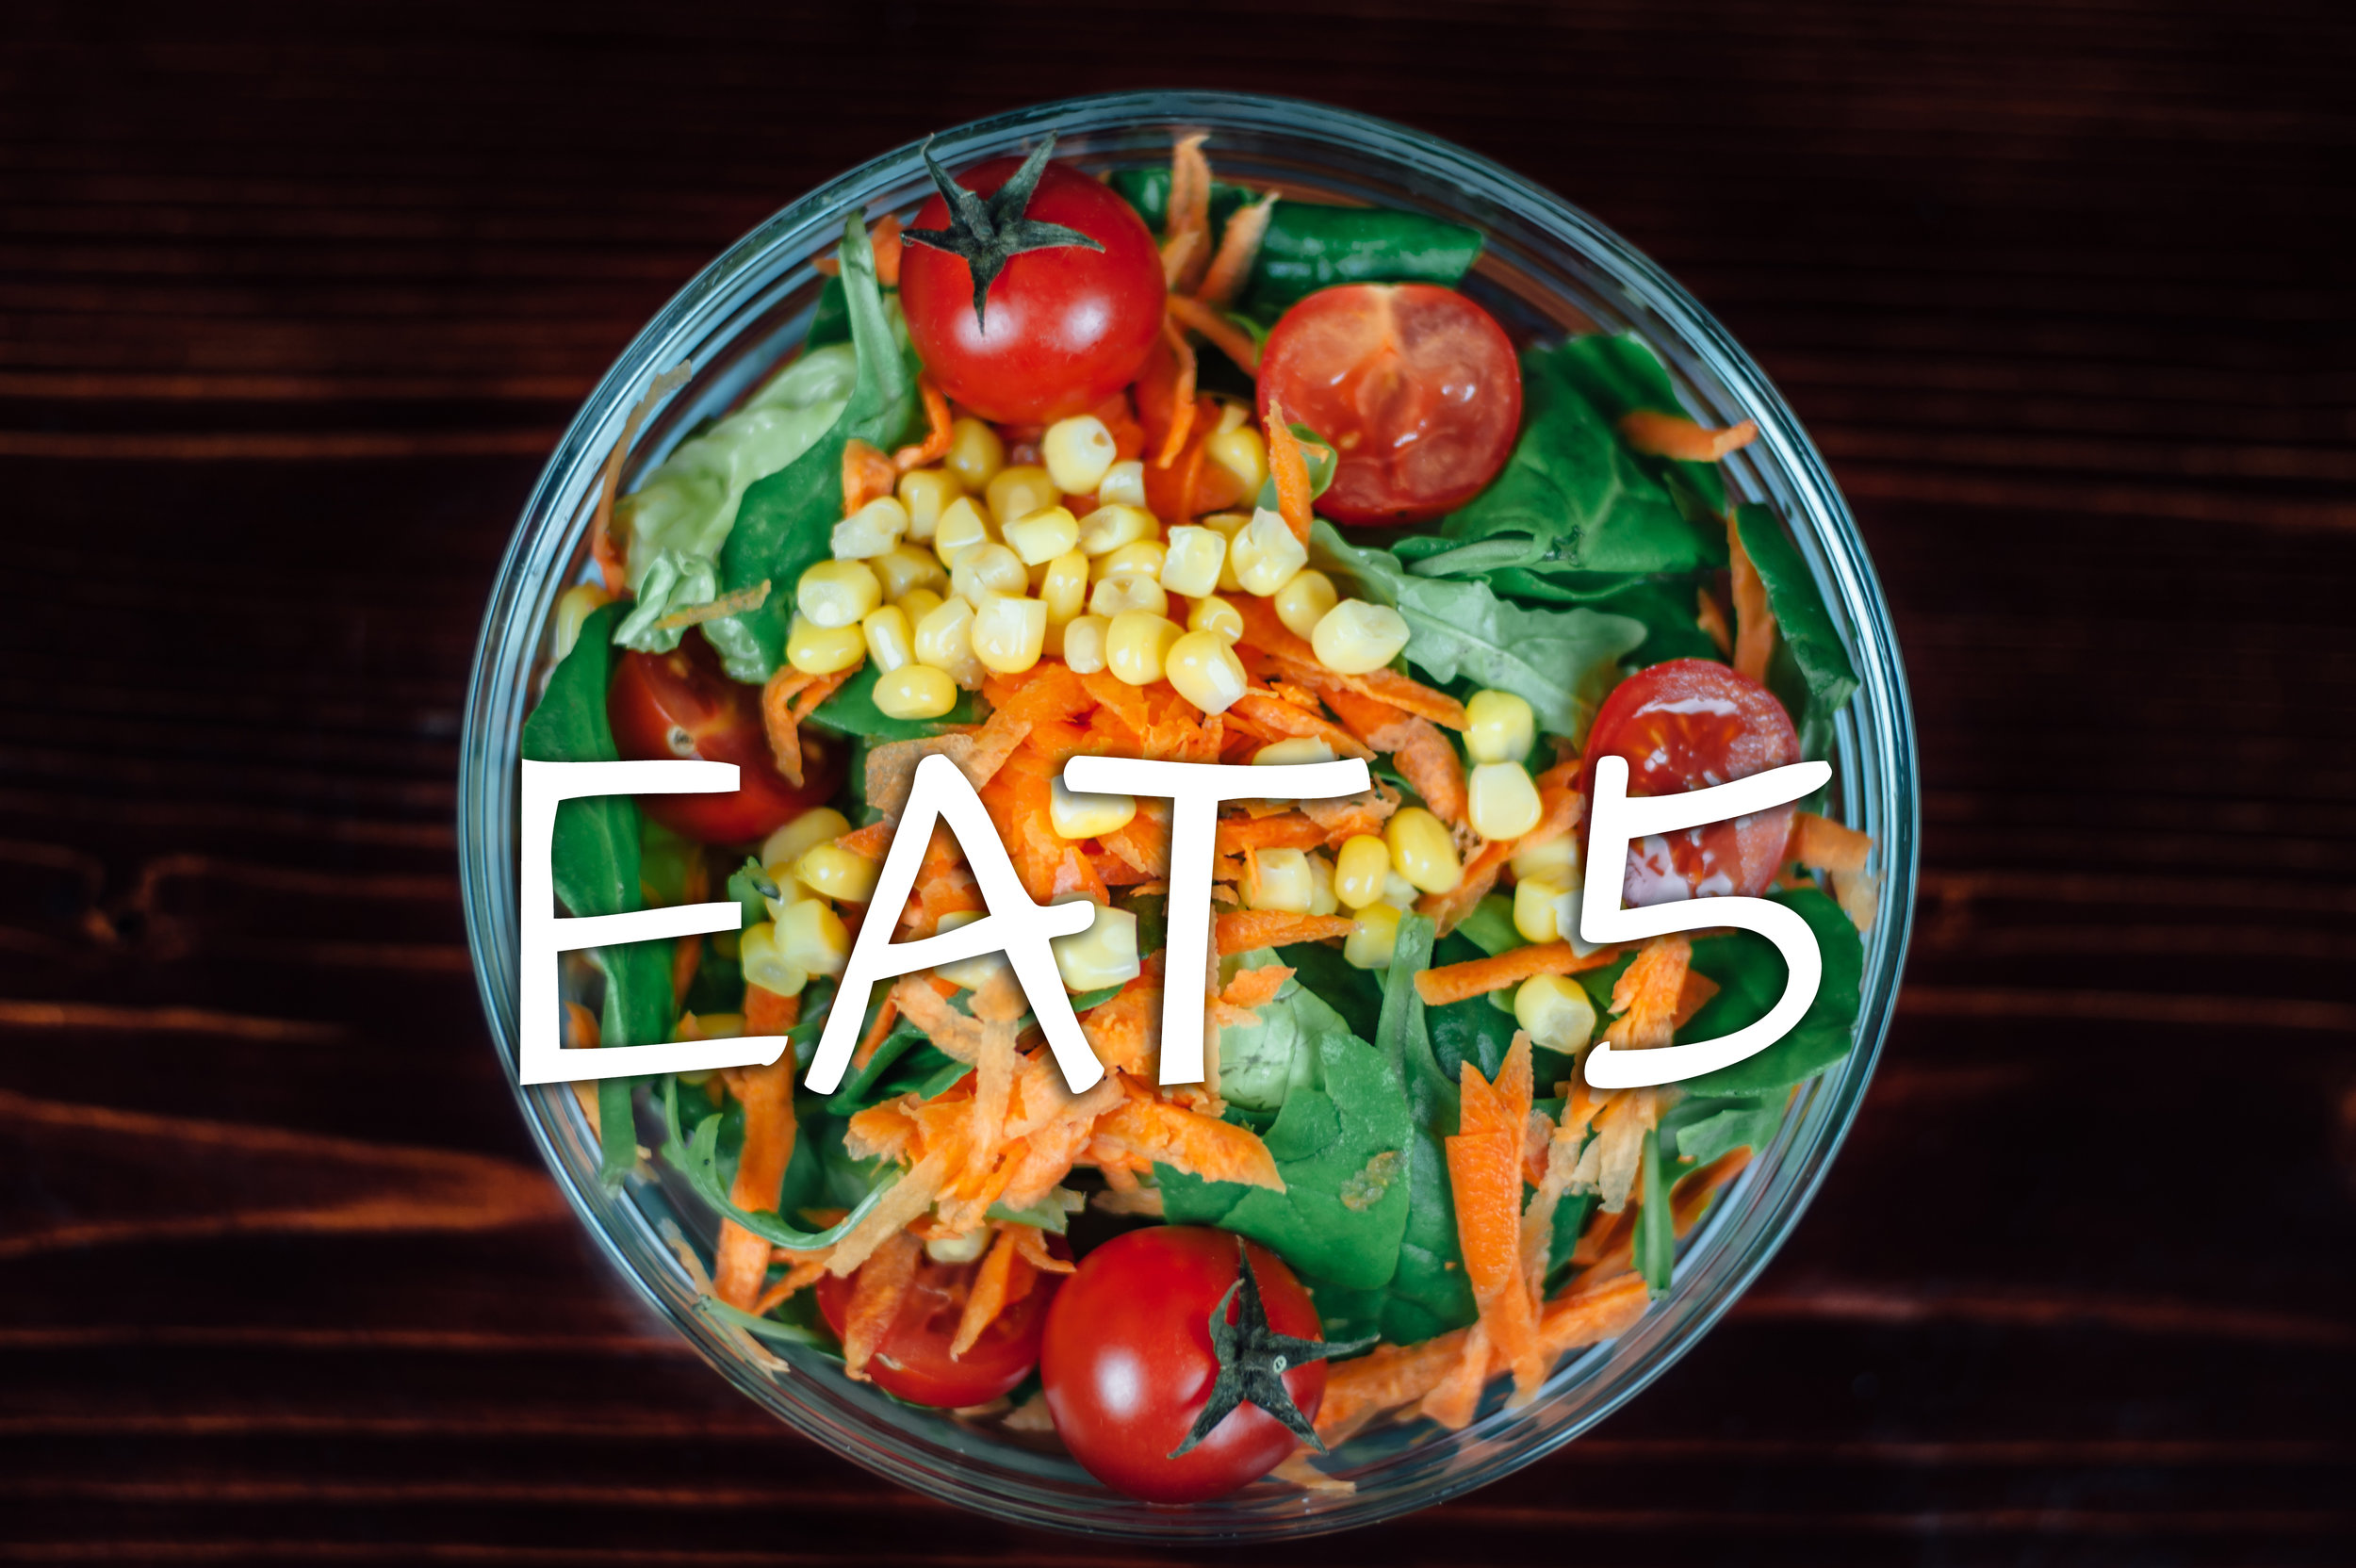 eat5-2.jpg